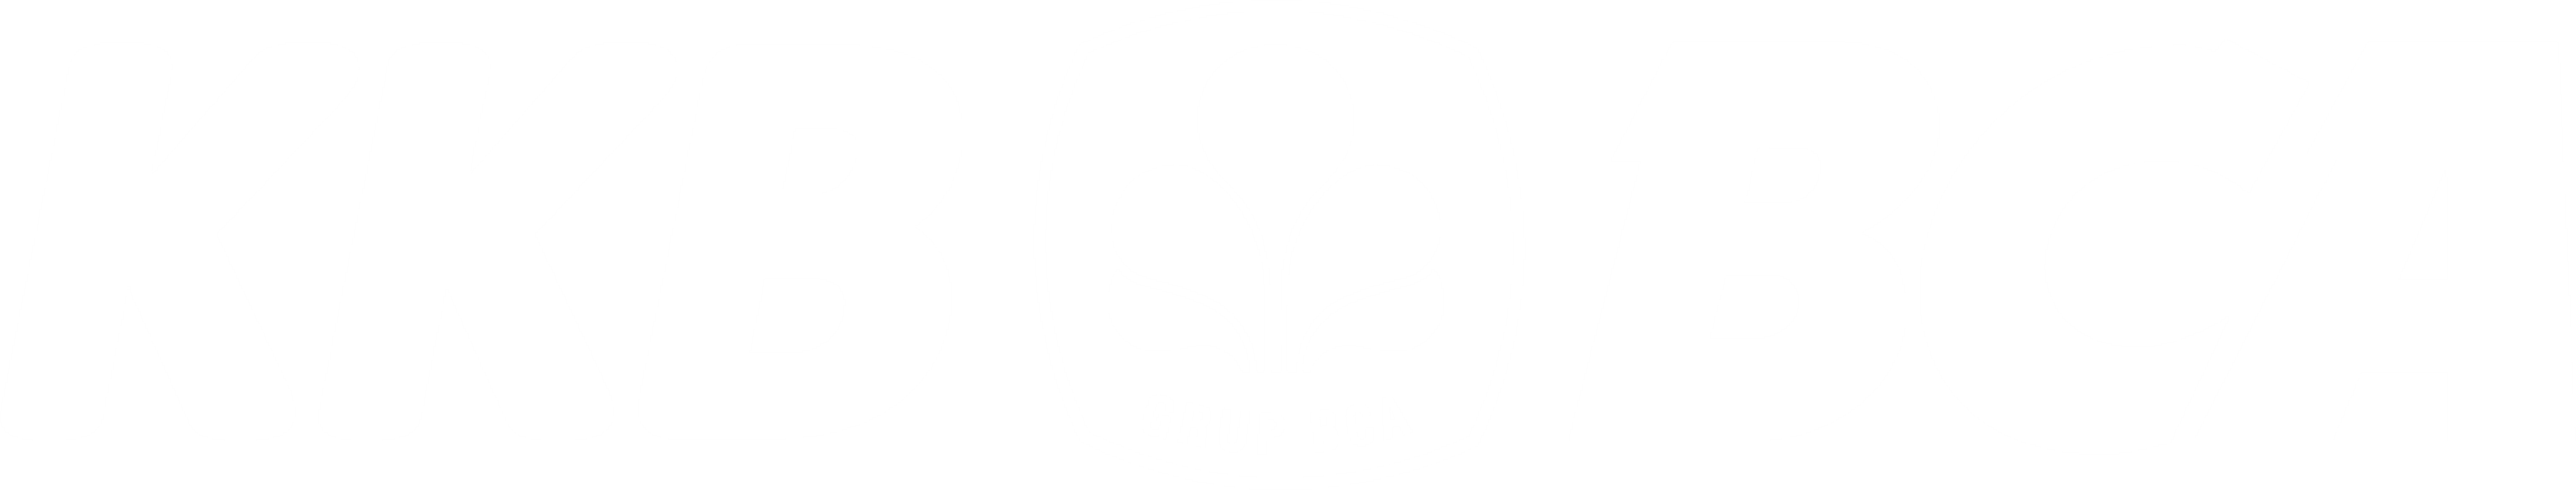 KKB BCA